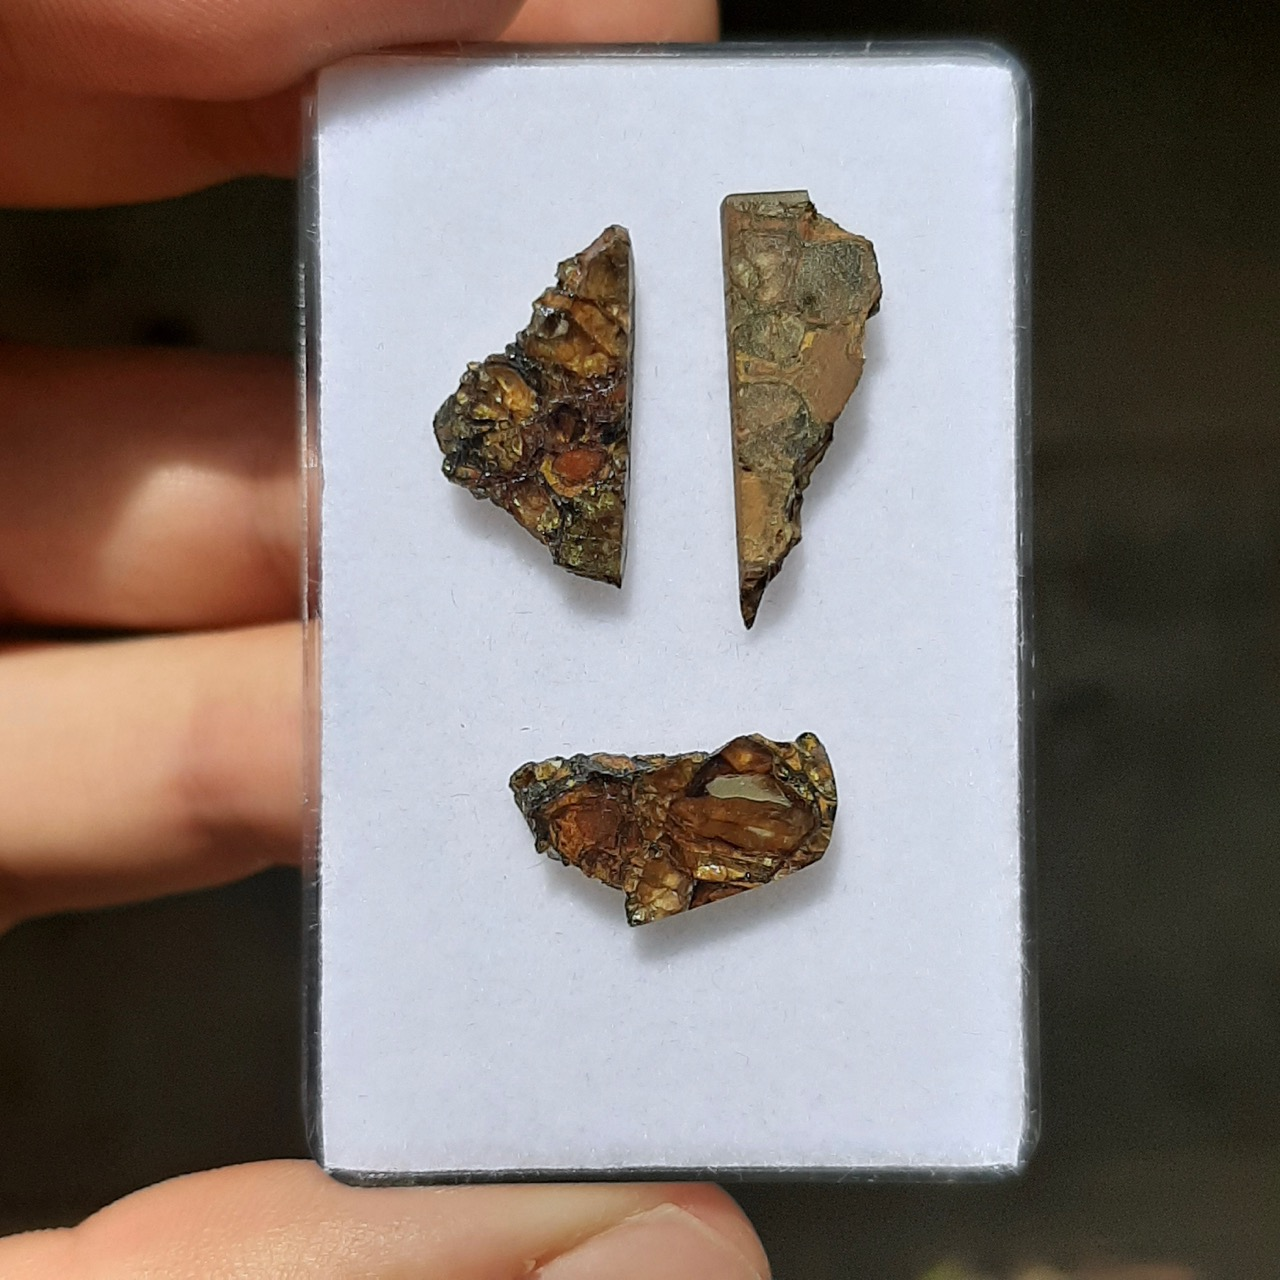 Jepara pallasite meteorite. 3 small slices.